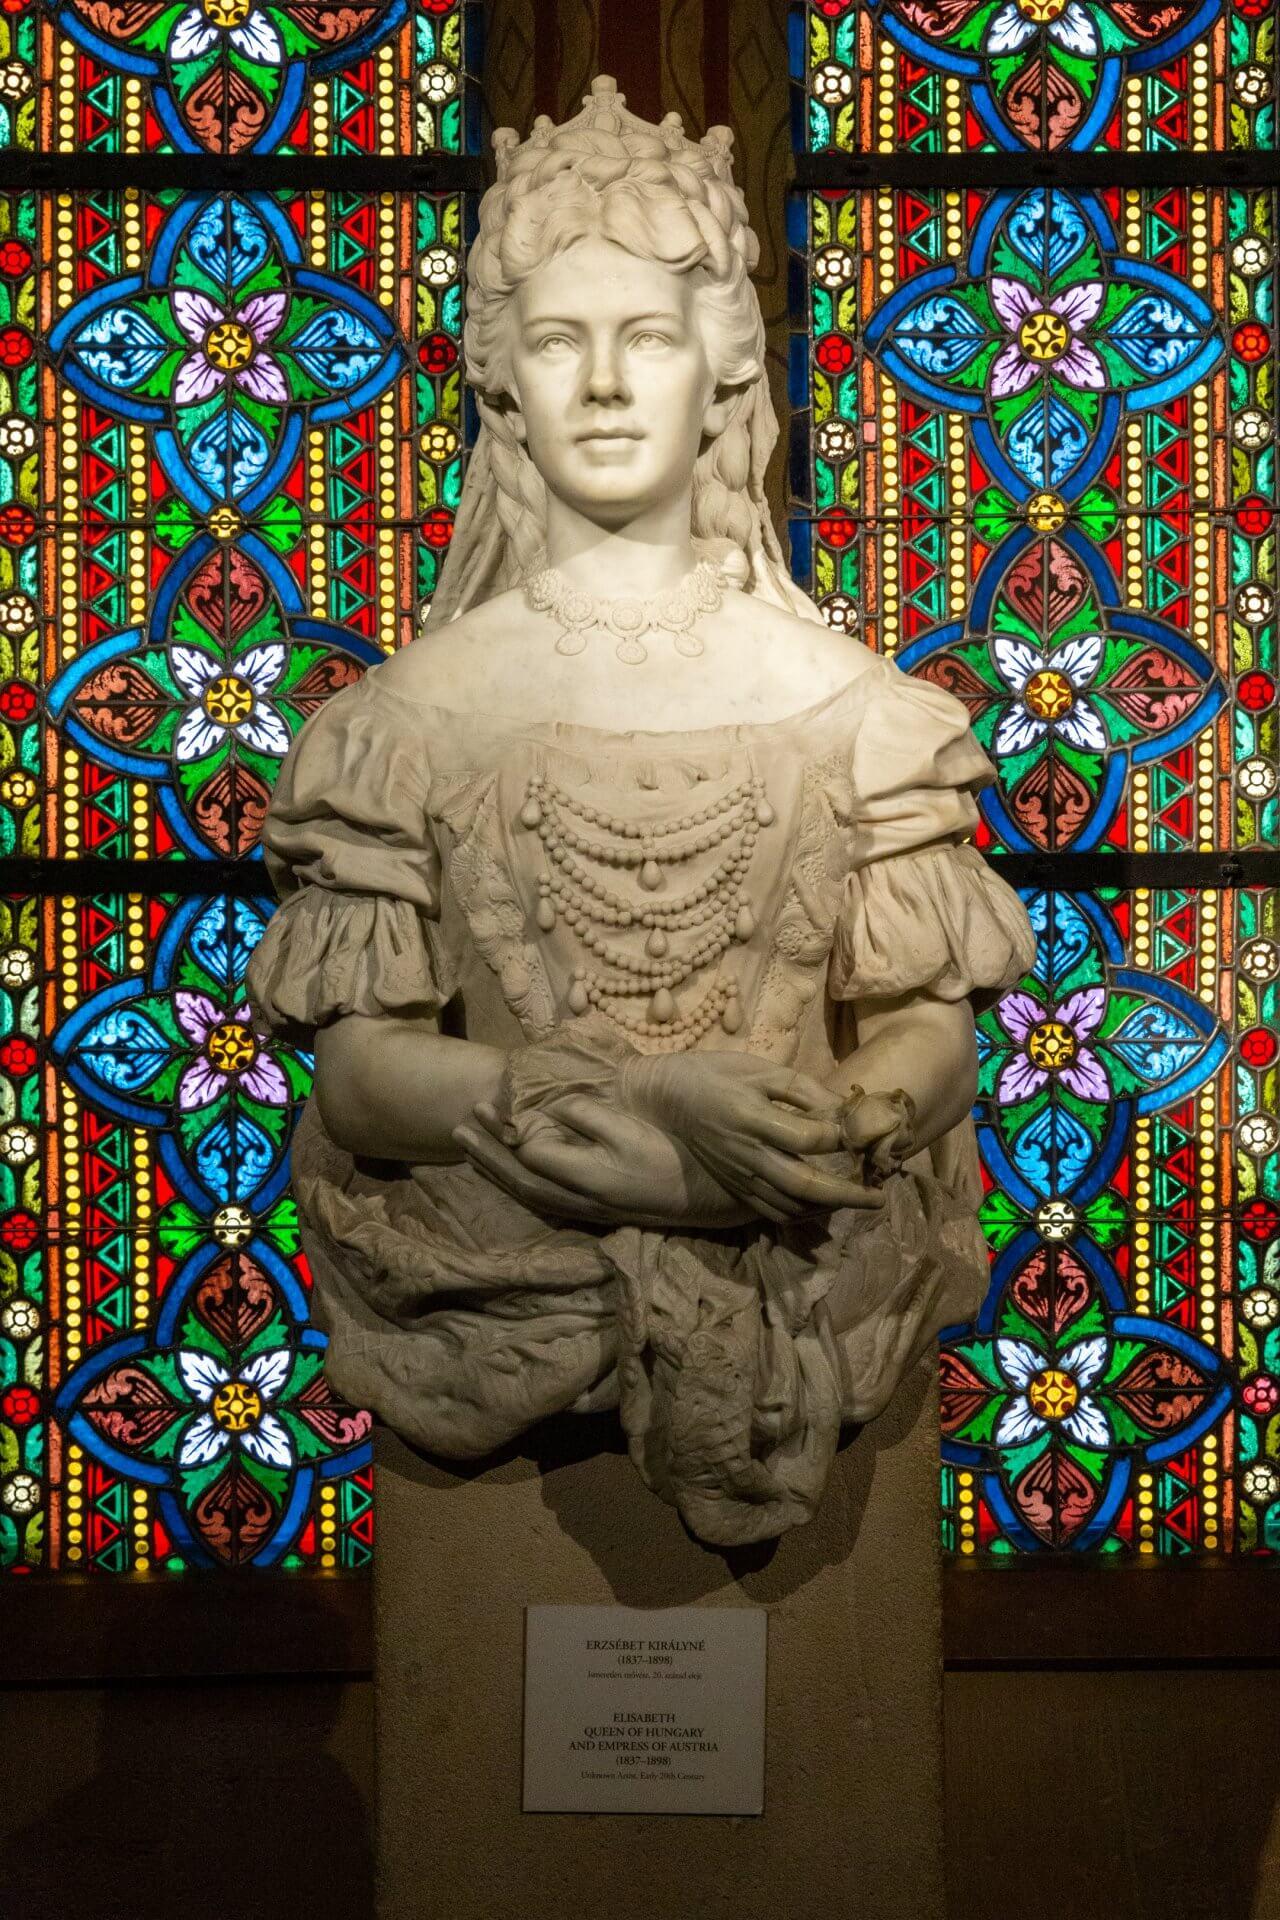 Sissi-Skulptur, Museum der Matthiaskirche Budapest